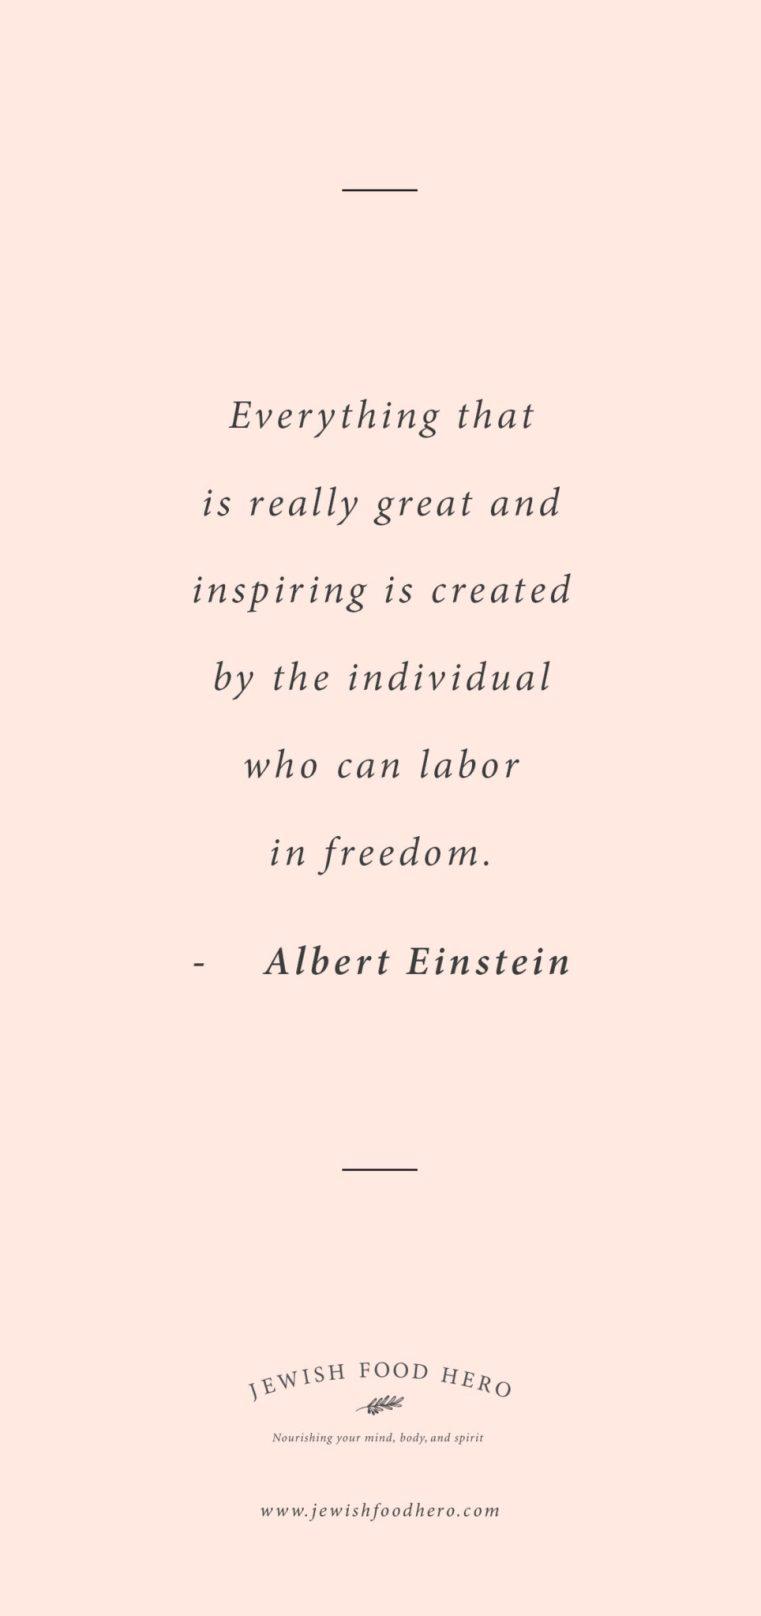 Quotes on Freedom, Jewish Quotes on Freedom, Albert Einstein